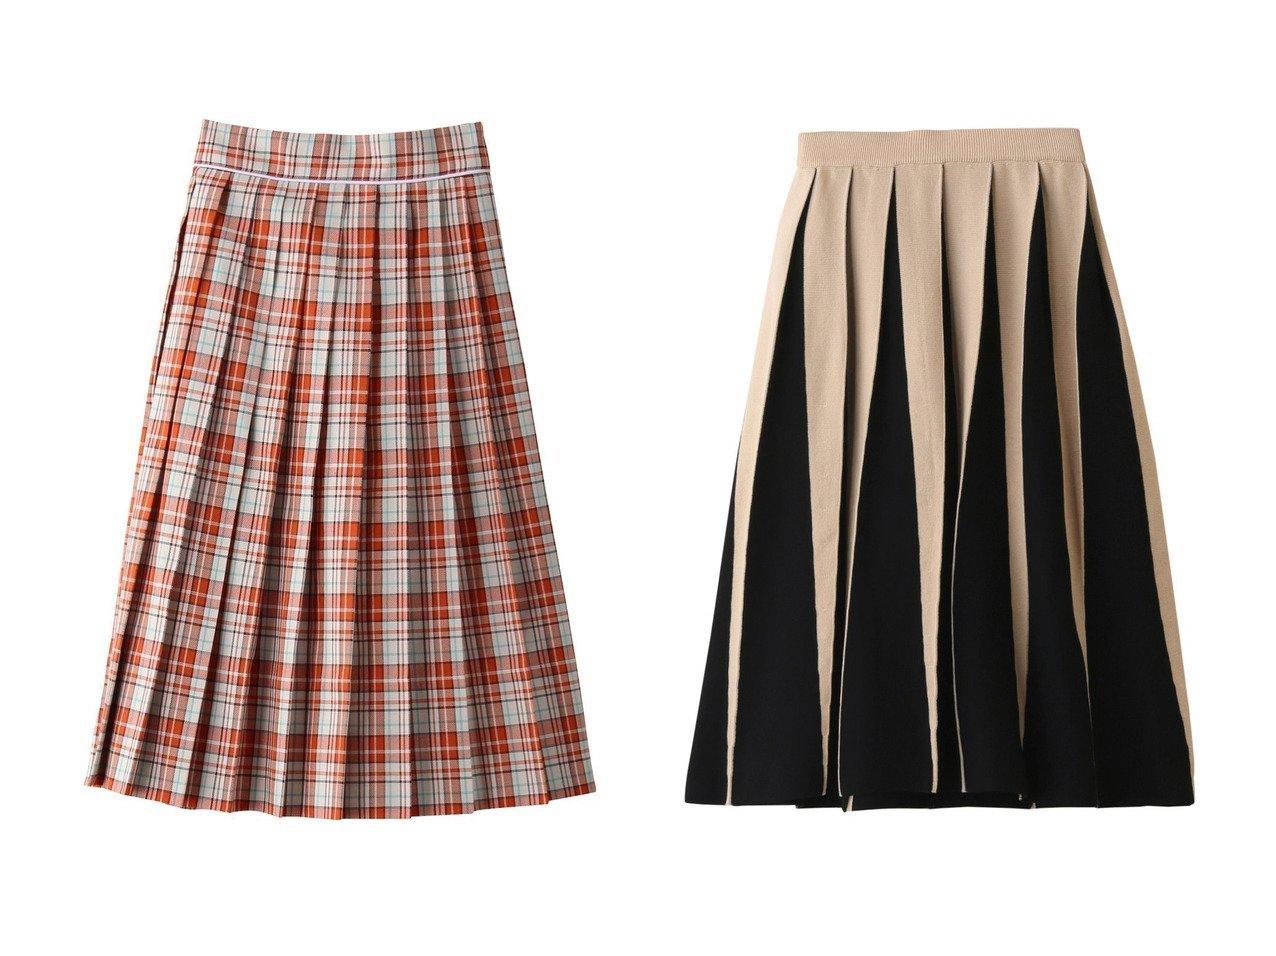 【Plan C/プラン C】のタータンチェックプリーツスカート&【MUVEIL/ミュベール】のニットプリーツスカート 【スカート】おすすめ!人気、トレンド・レディースファッションの通販 おすすめで人気の流行・トレンド、ファッションの通販商品 メンズファッション・キッズファッション・インテリア・家具・レディースファッション・服の通販 founy(ファニー) https://founy.com/ ファッション Fashion レディースファッション WOMEN スカート Skirt プリーツスカート Pleated Skirts ロングスカート Long Skirt プリーツ ロング |ID:crp329100000029603